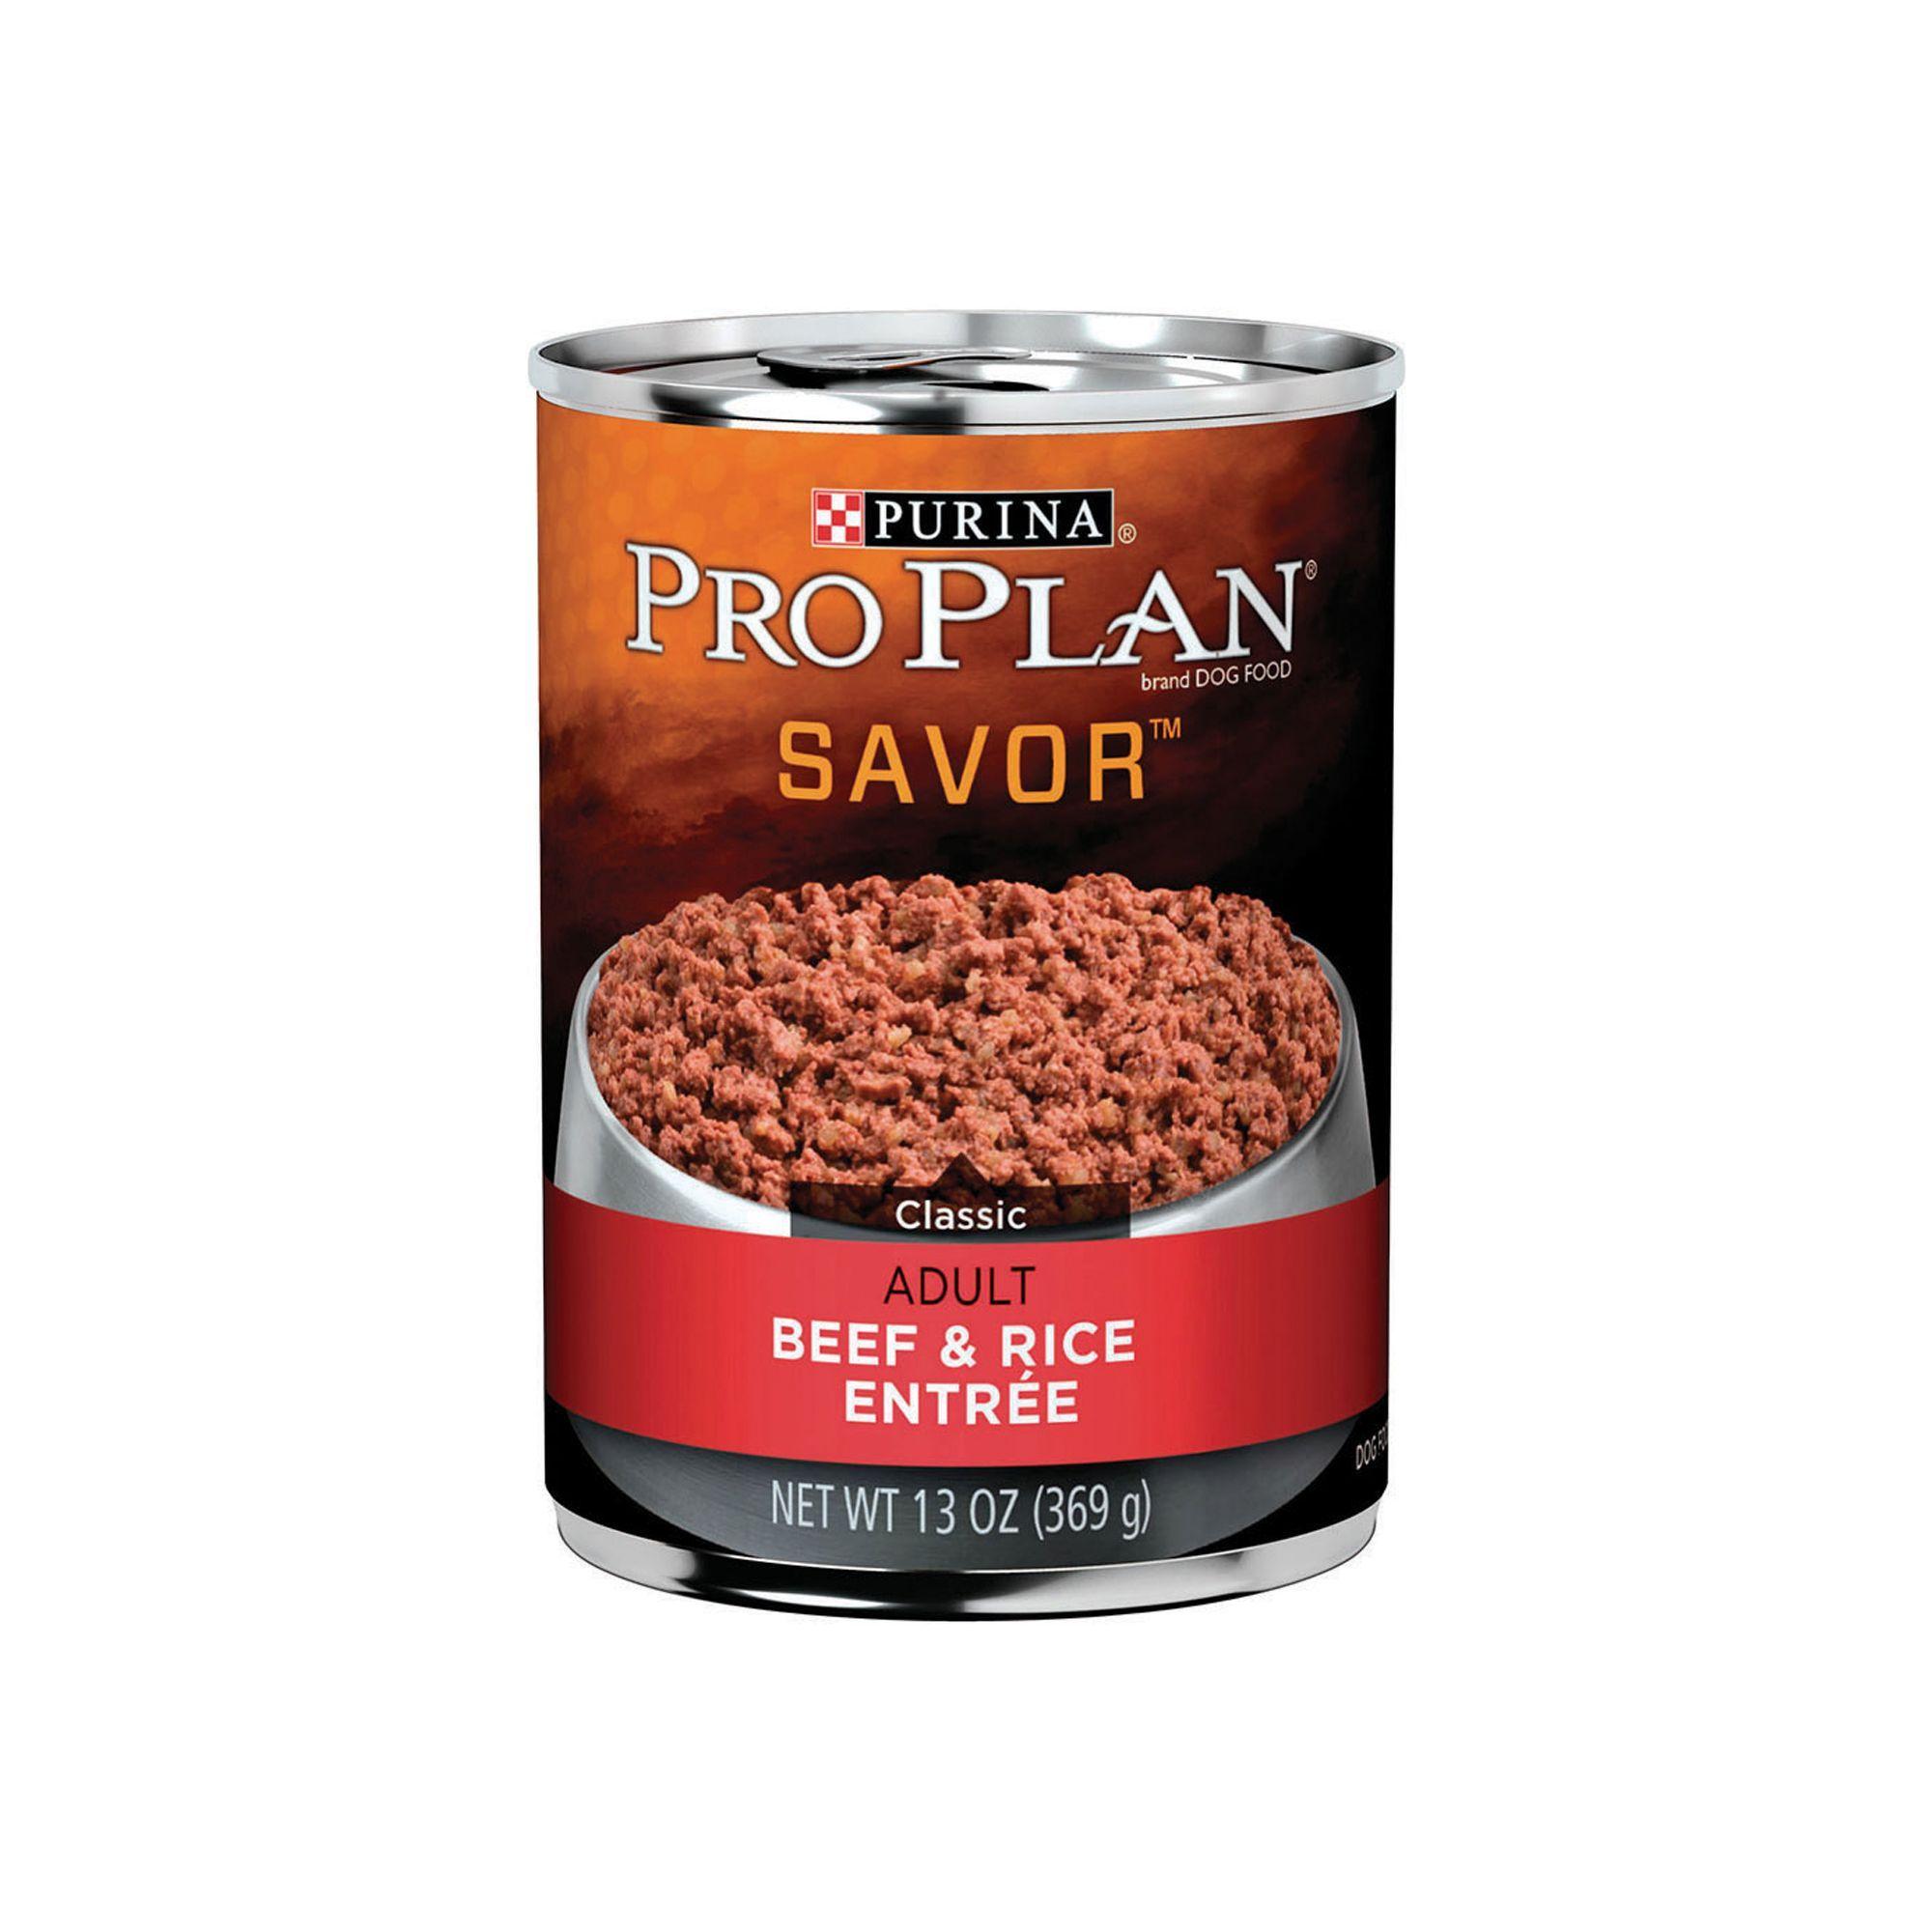 Purina Pro Plan Savor Adult Dog Food Size 13 Oz Copper Gum Zinc